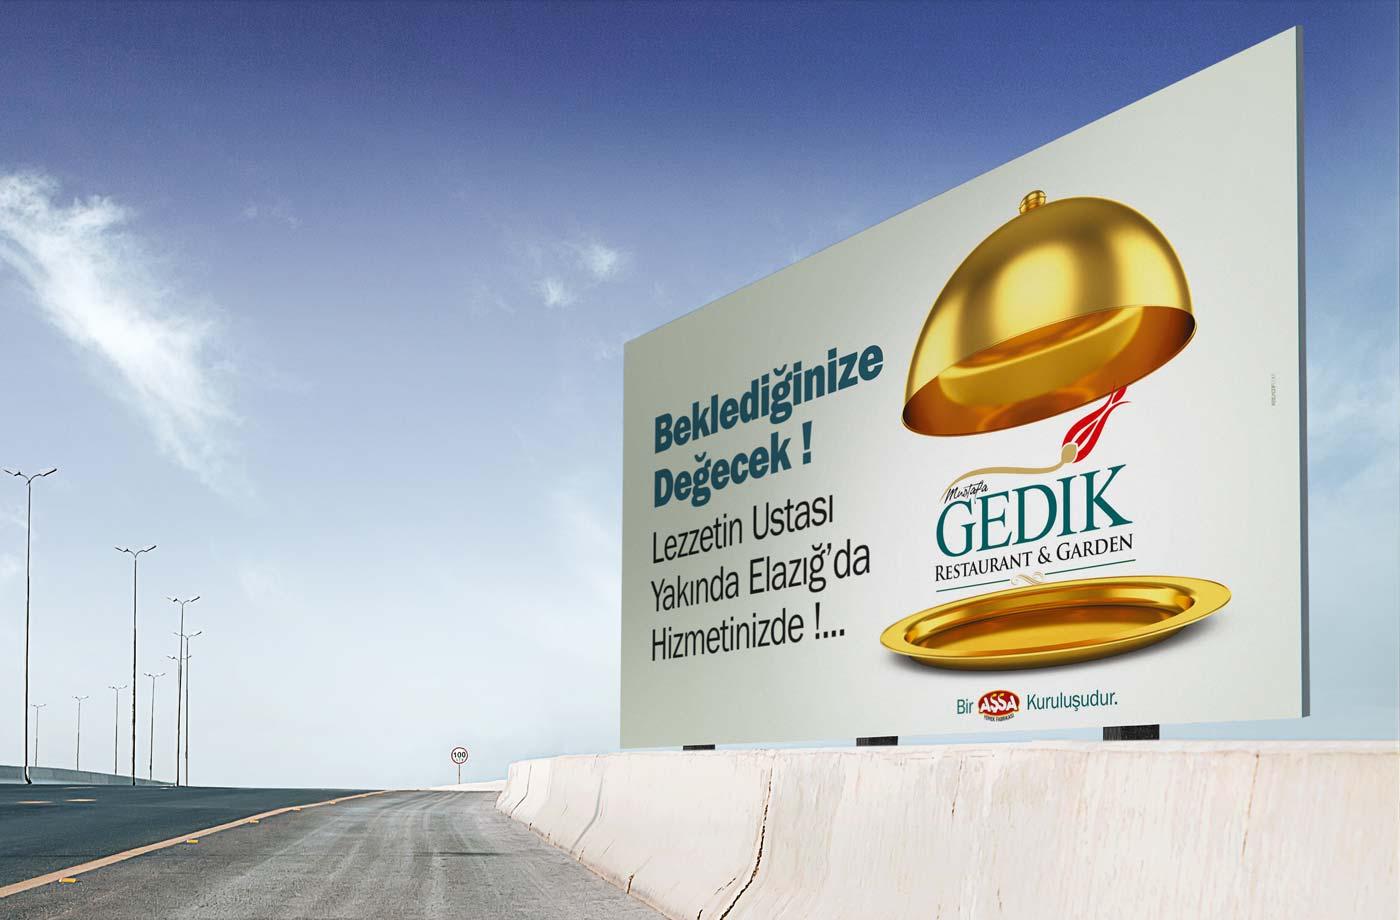 gedik-restaurant-billboard